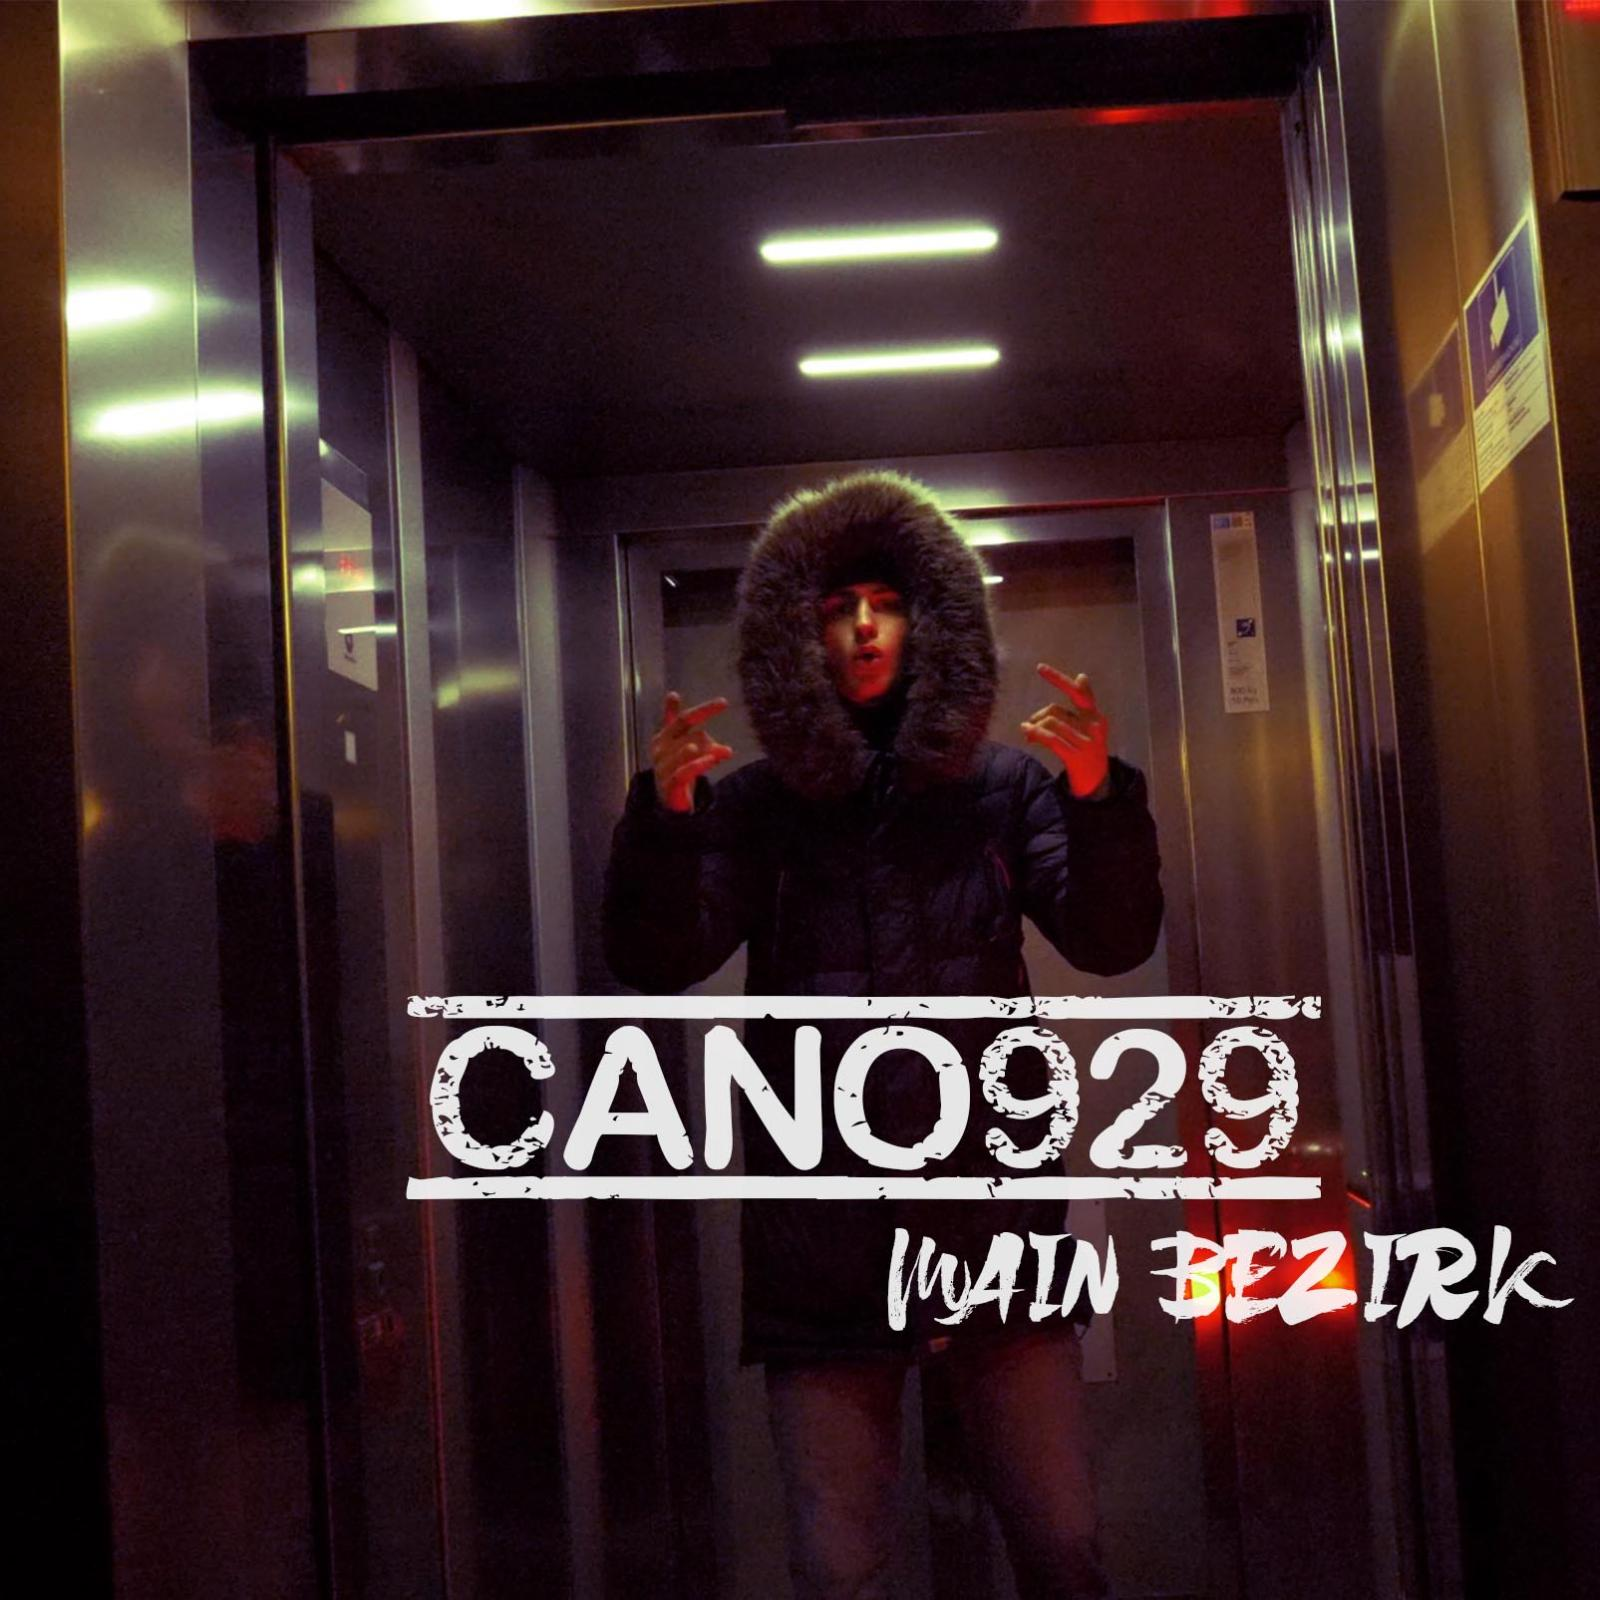 Upcoming: Cano929 - Main Bezirk